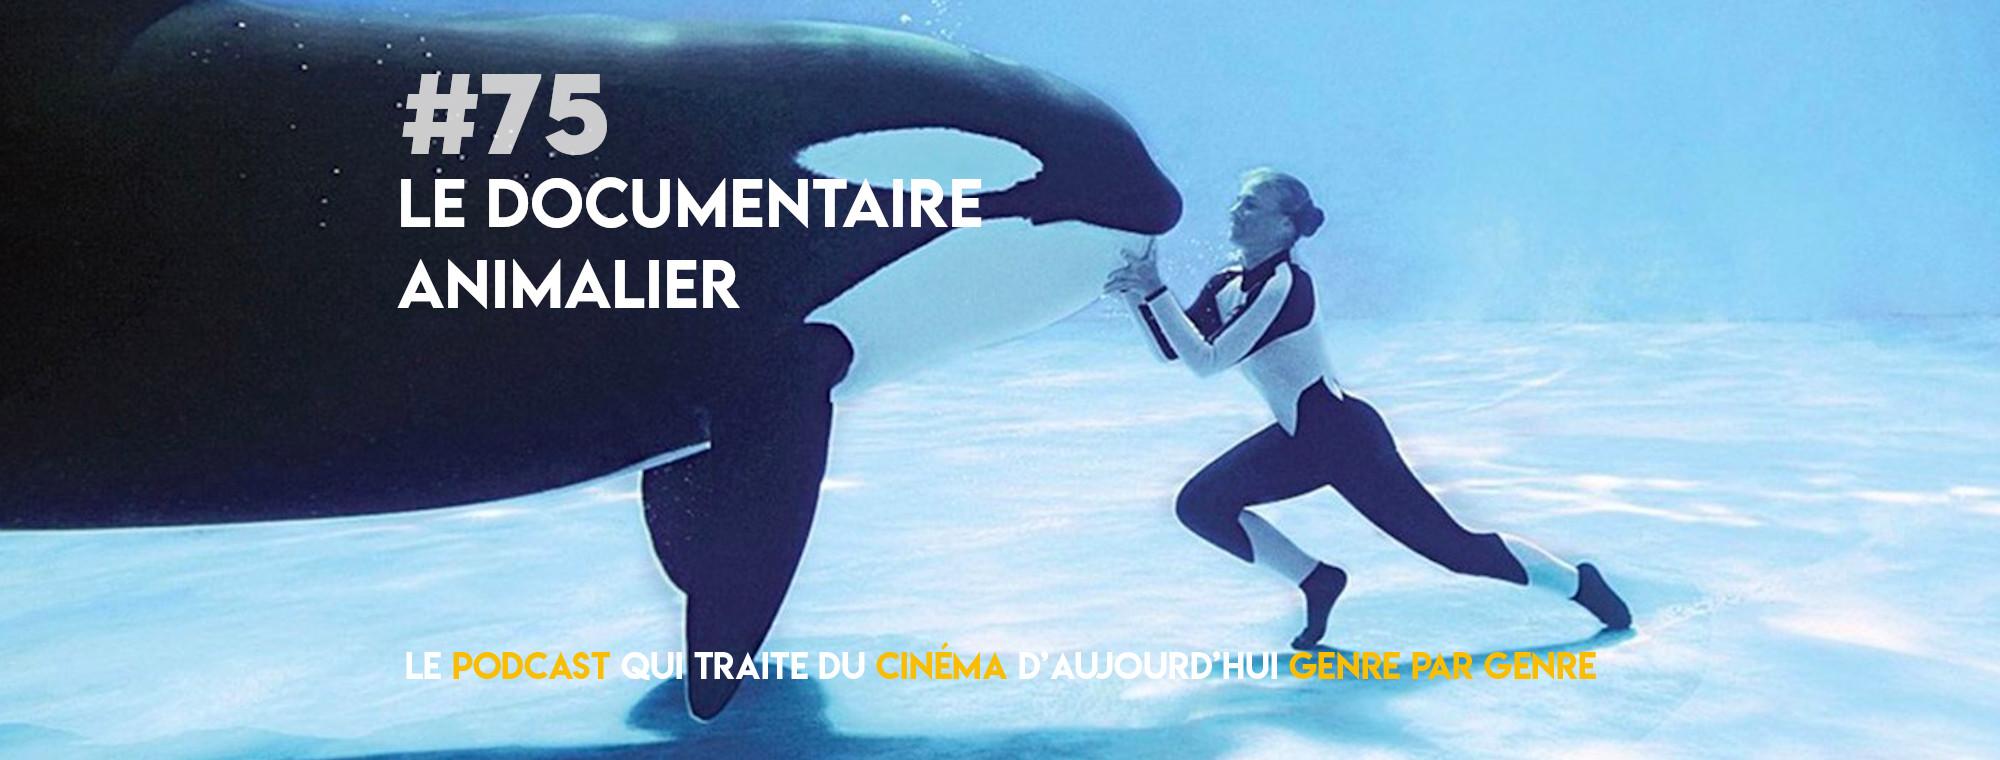 Parlons Péloches - #75 Le documentaire animalier